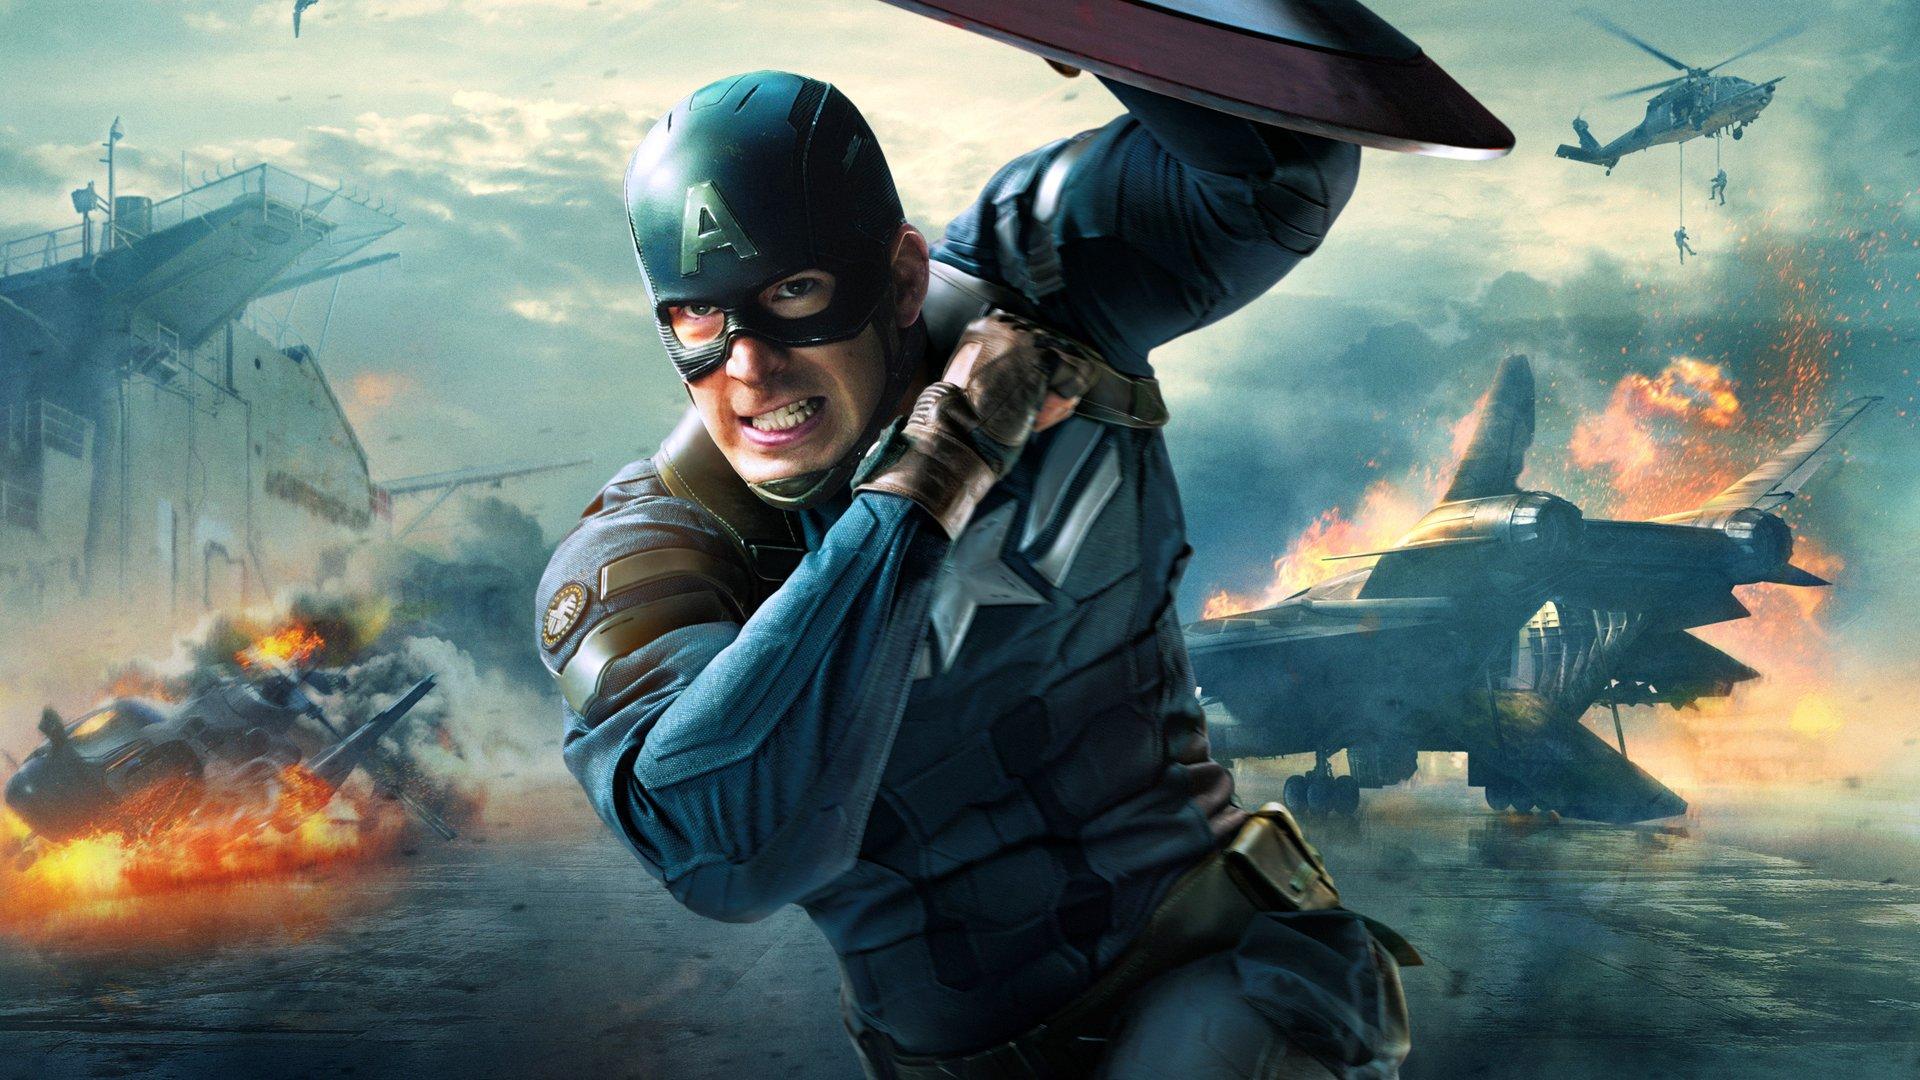 Capetan America Superhero Movie Wallpaper